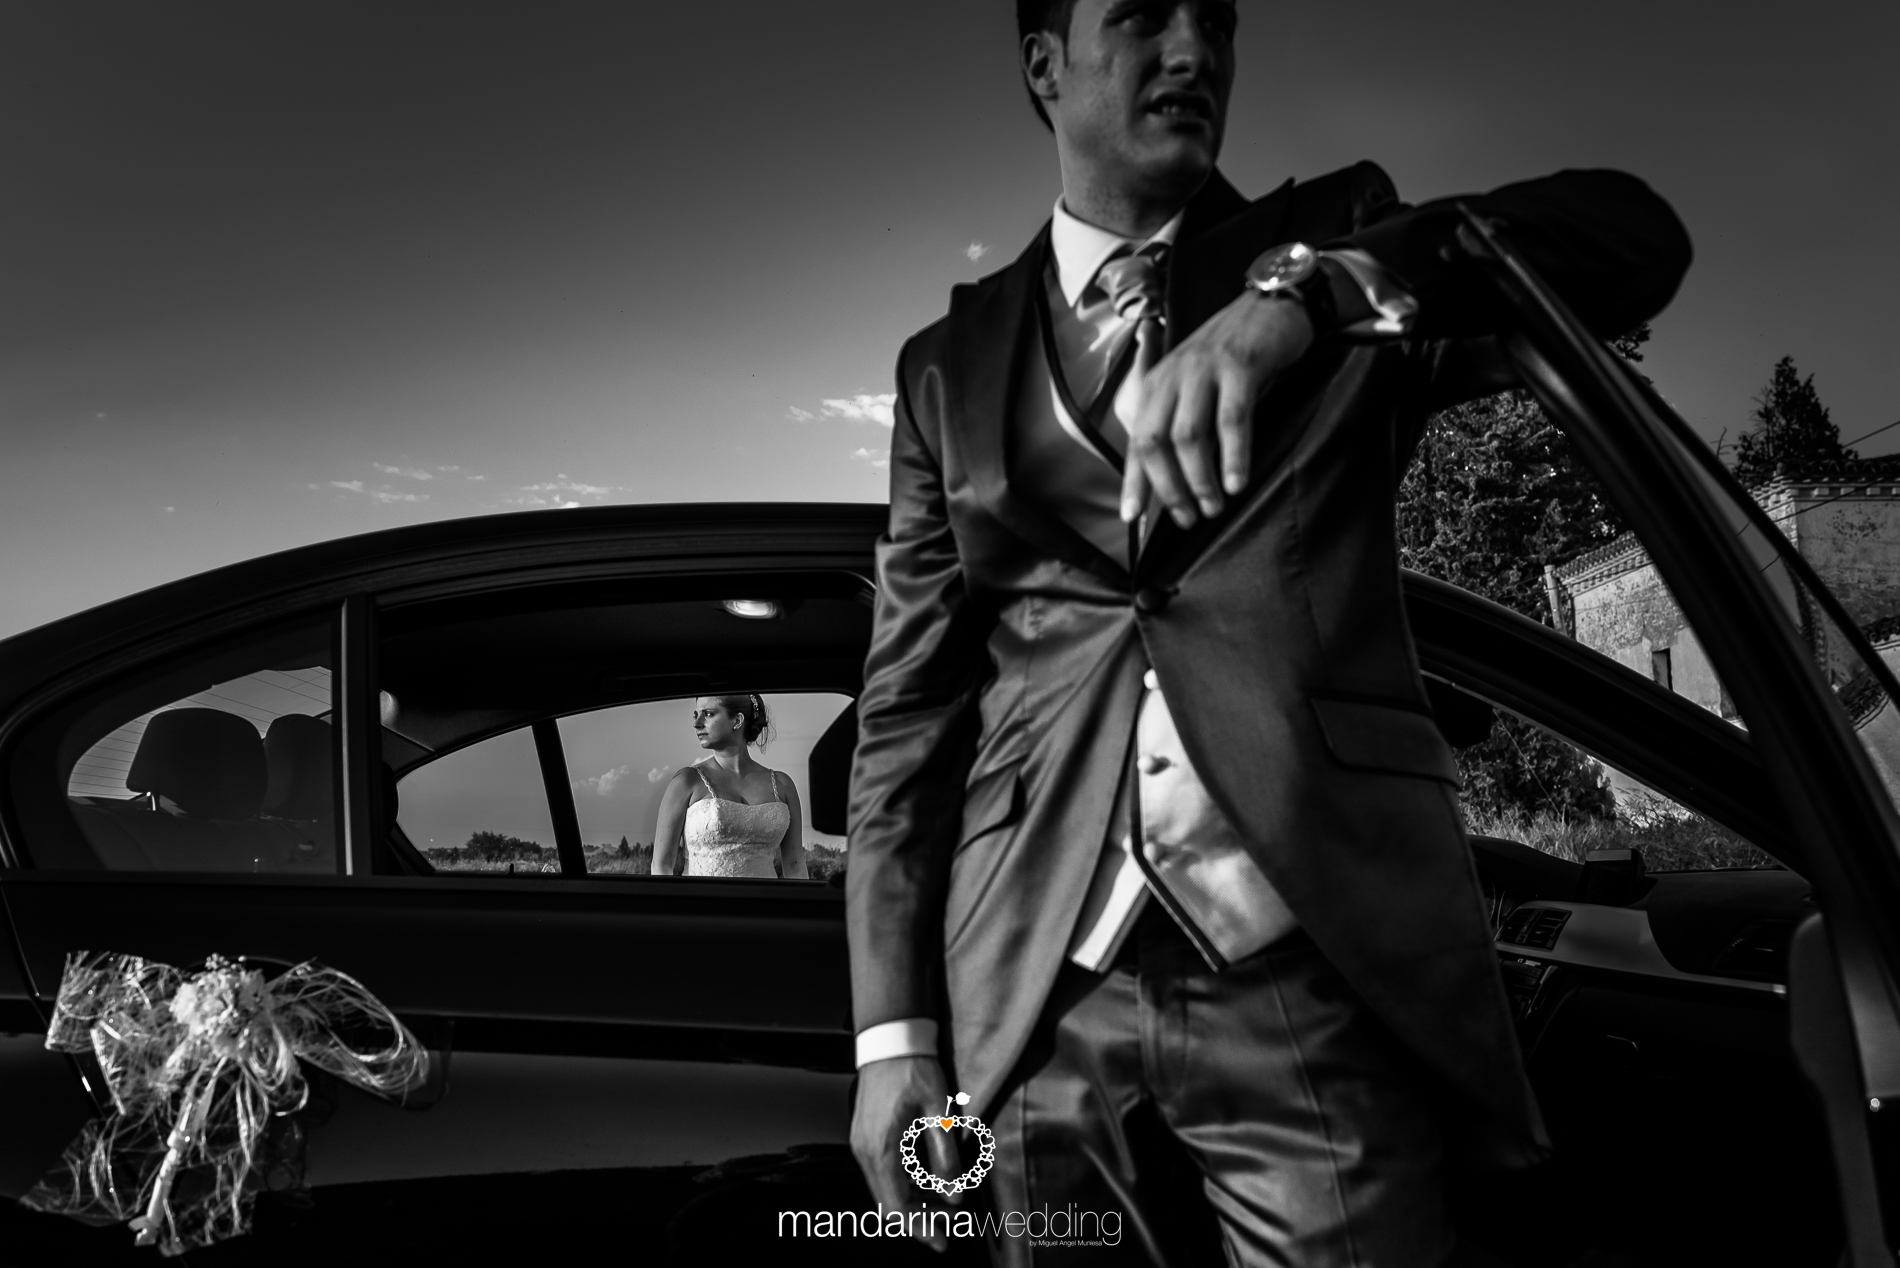 mandarina wedding, mejores fotografos boda, fotografo zaragoza, fotografo huesca, fotografo soria, fotografo lerida_53